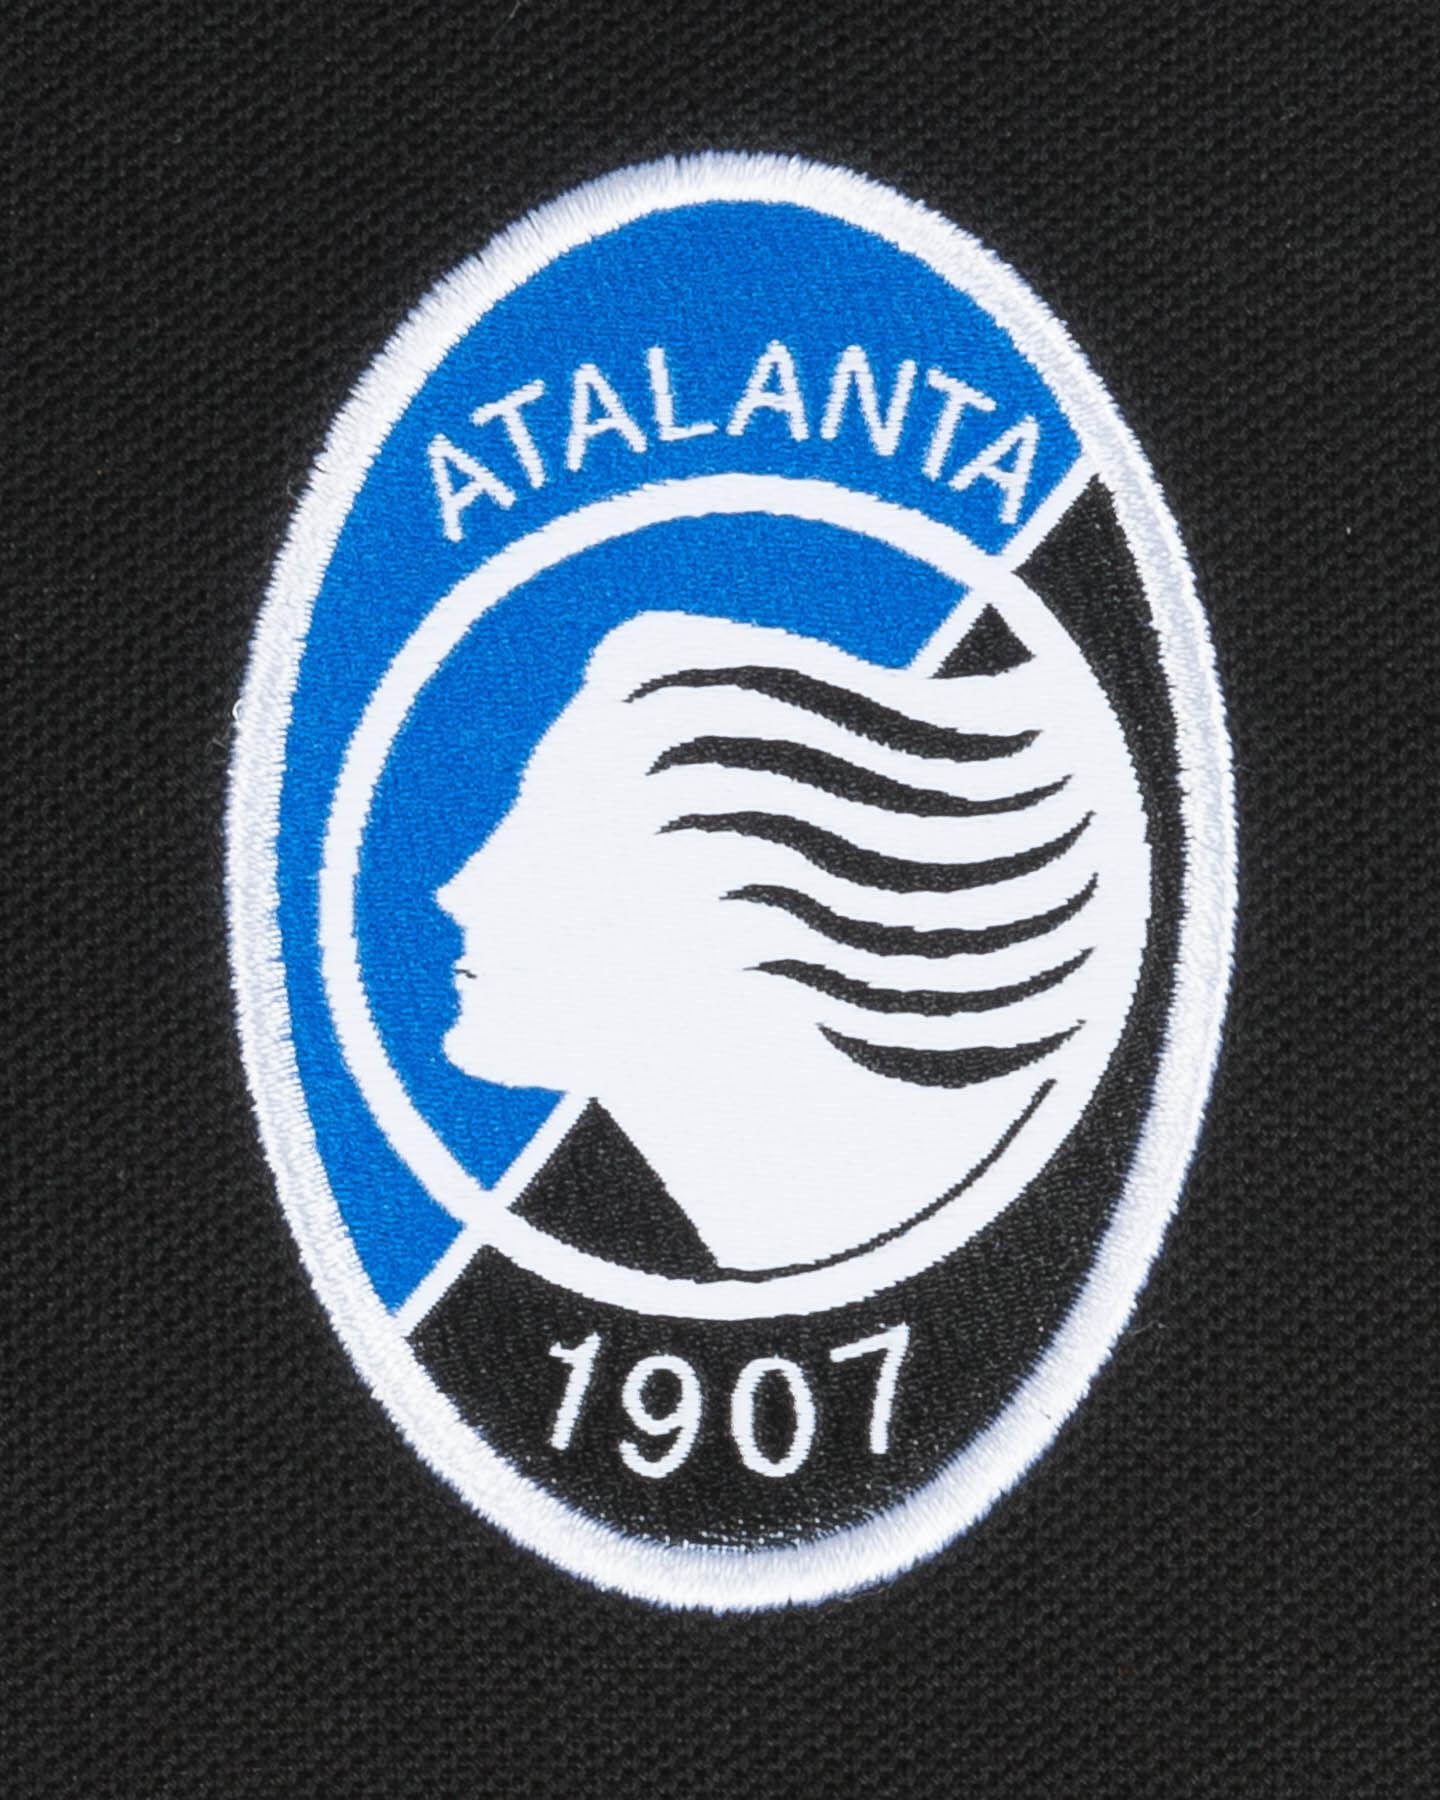 ATALANTA 20-21 M